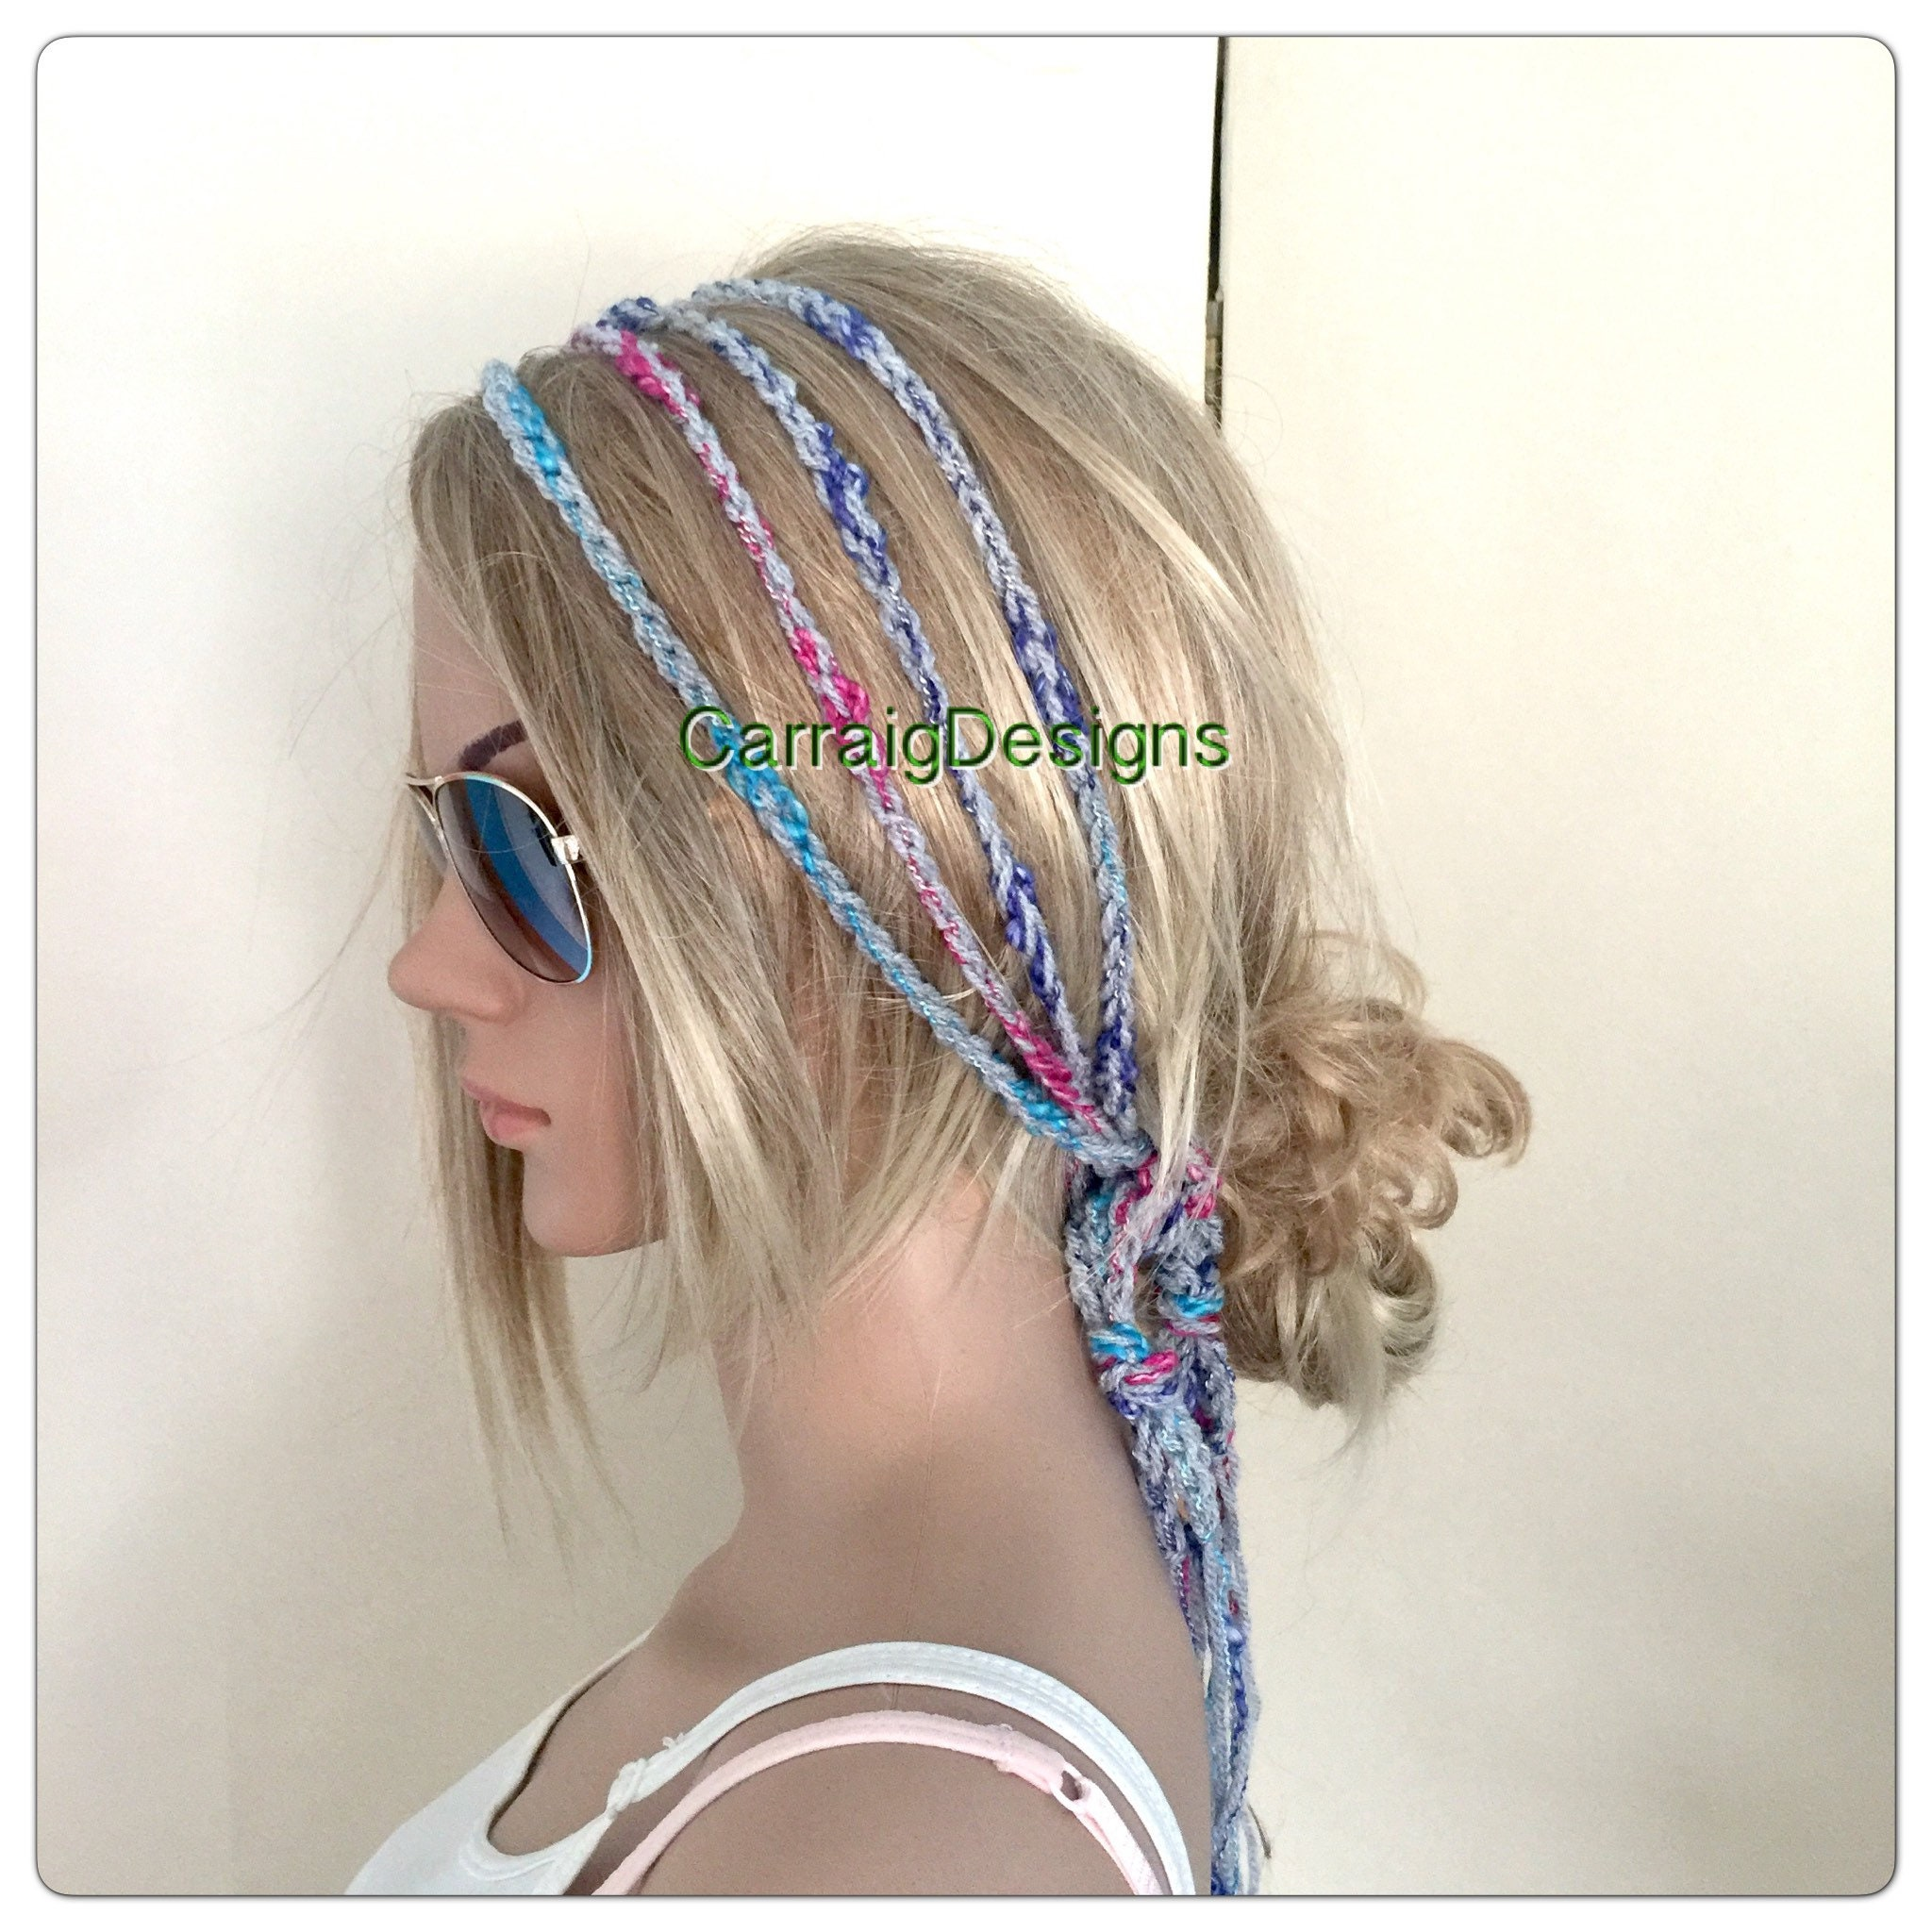 Rasta Womens Gypsy Hairband Hair Wrap Designer dread headband womens teens  yoga hand knit crochet black rainbow tube hippy hippie boho 6468468b1e0